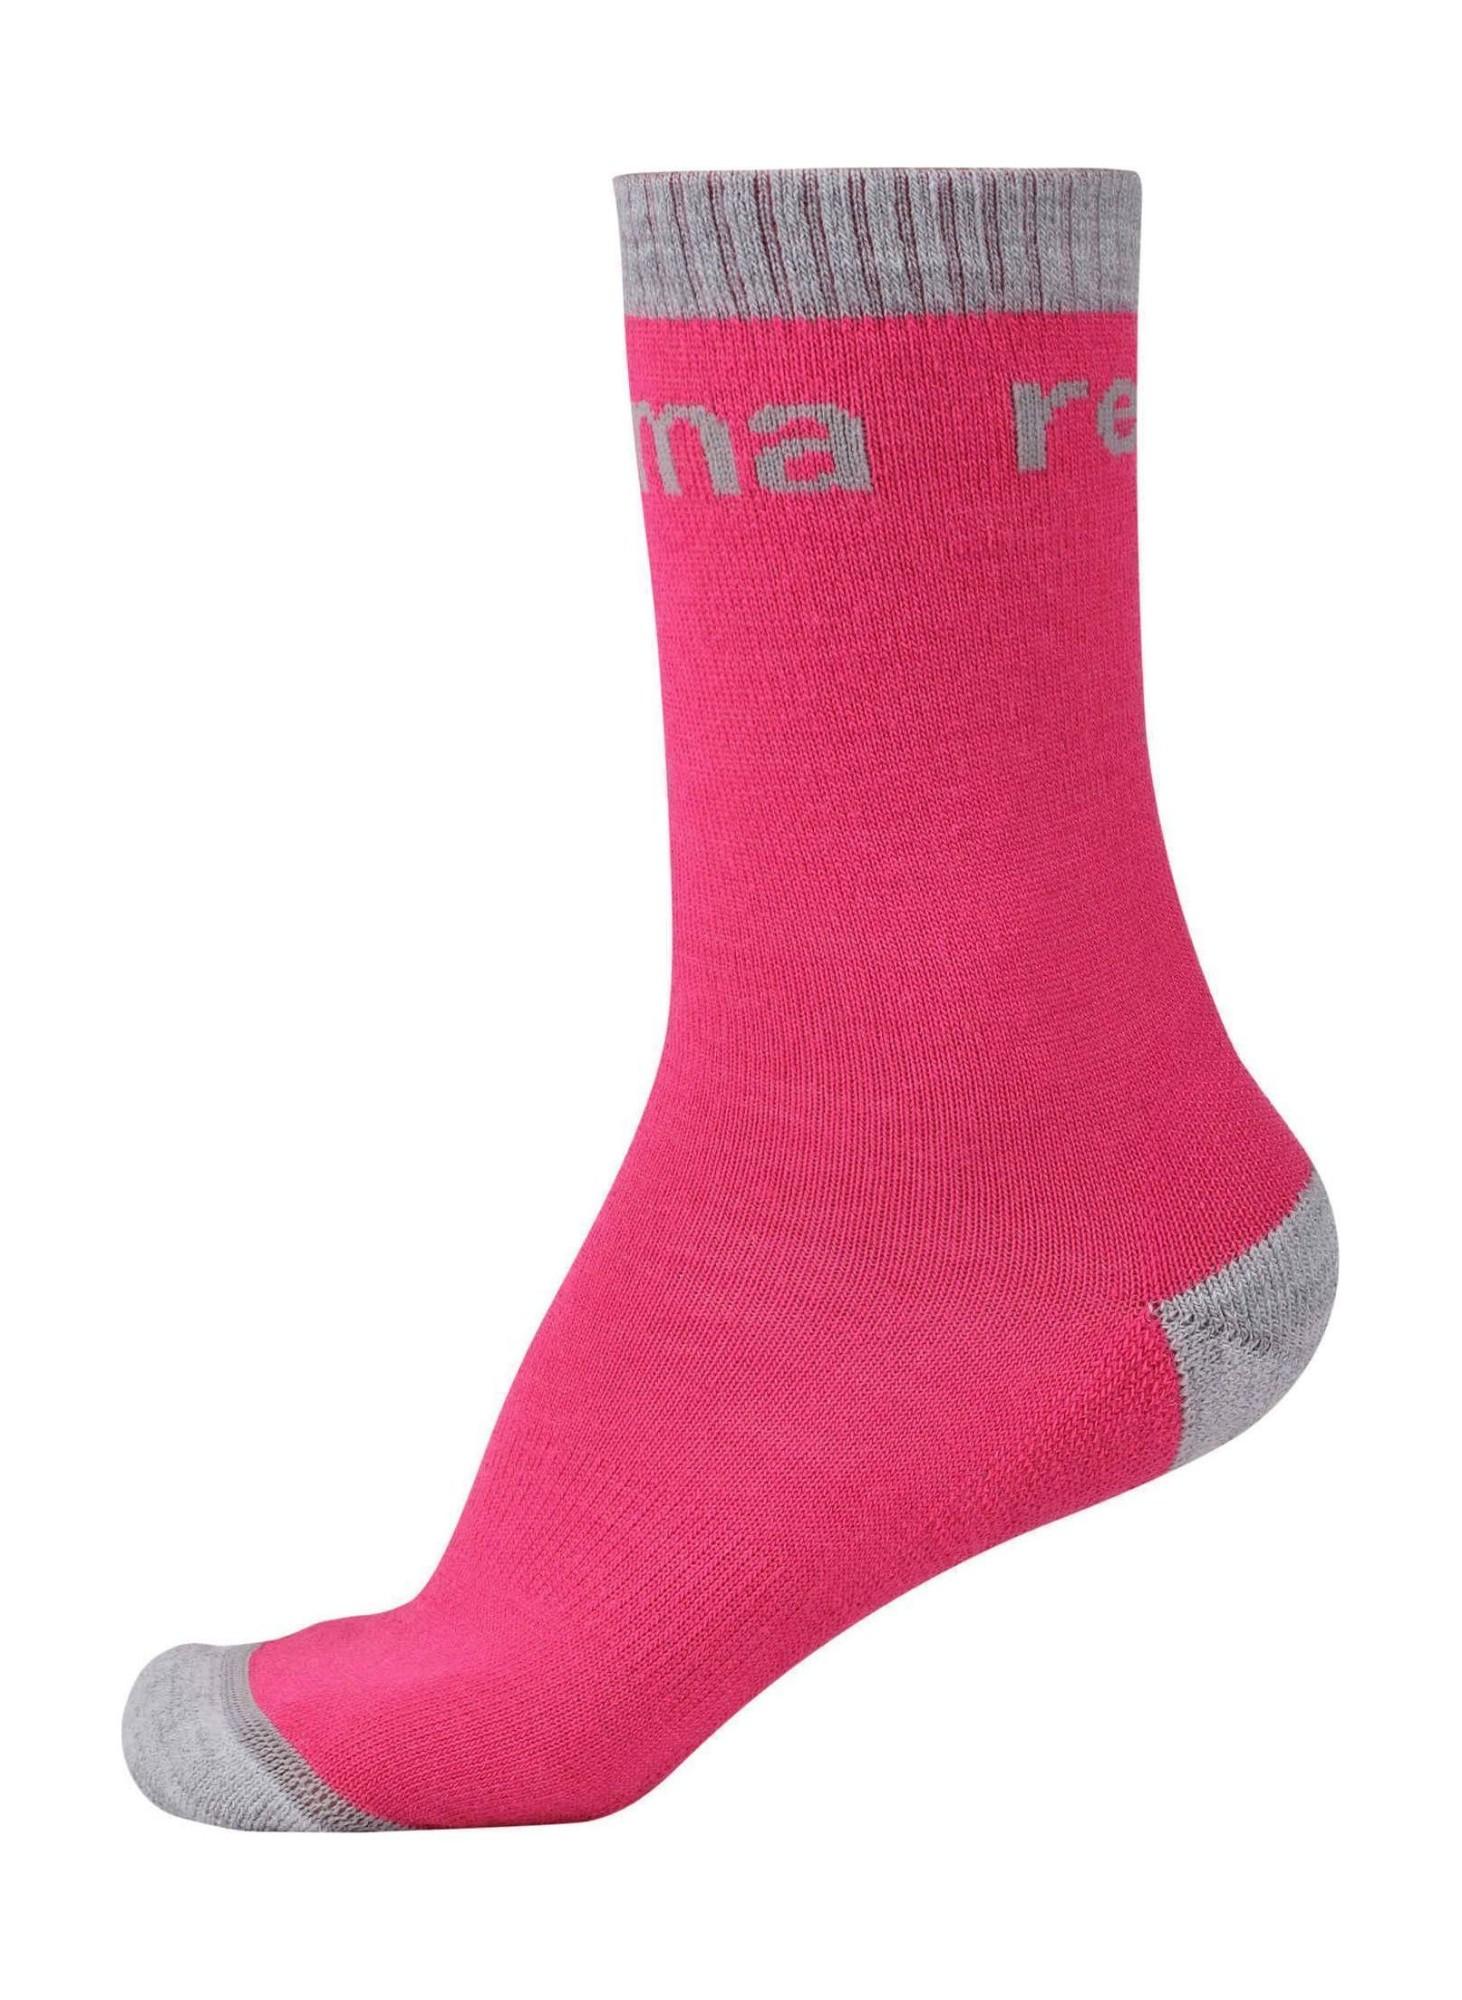 REIMA Boot Raspberry Pink 22-25